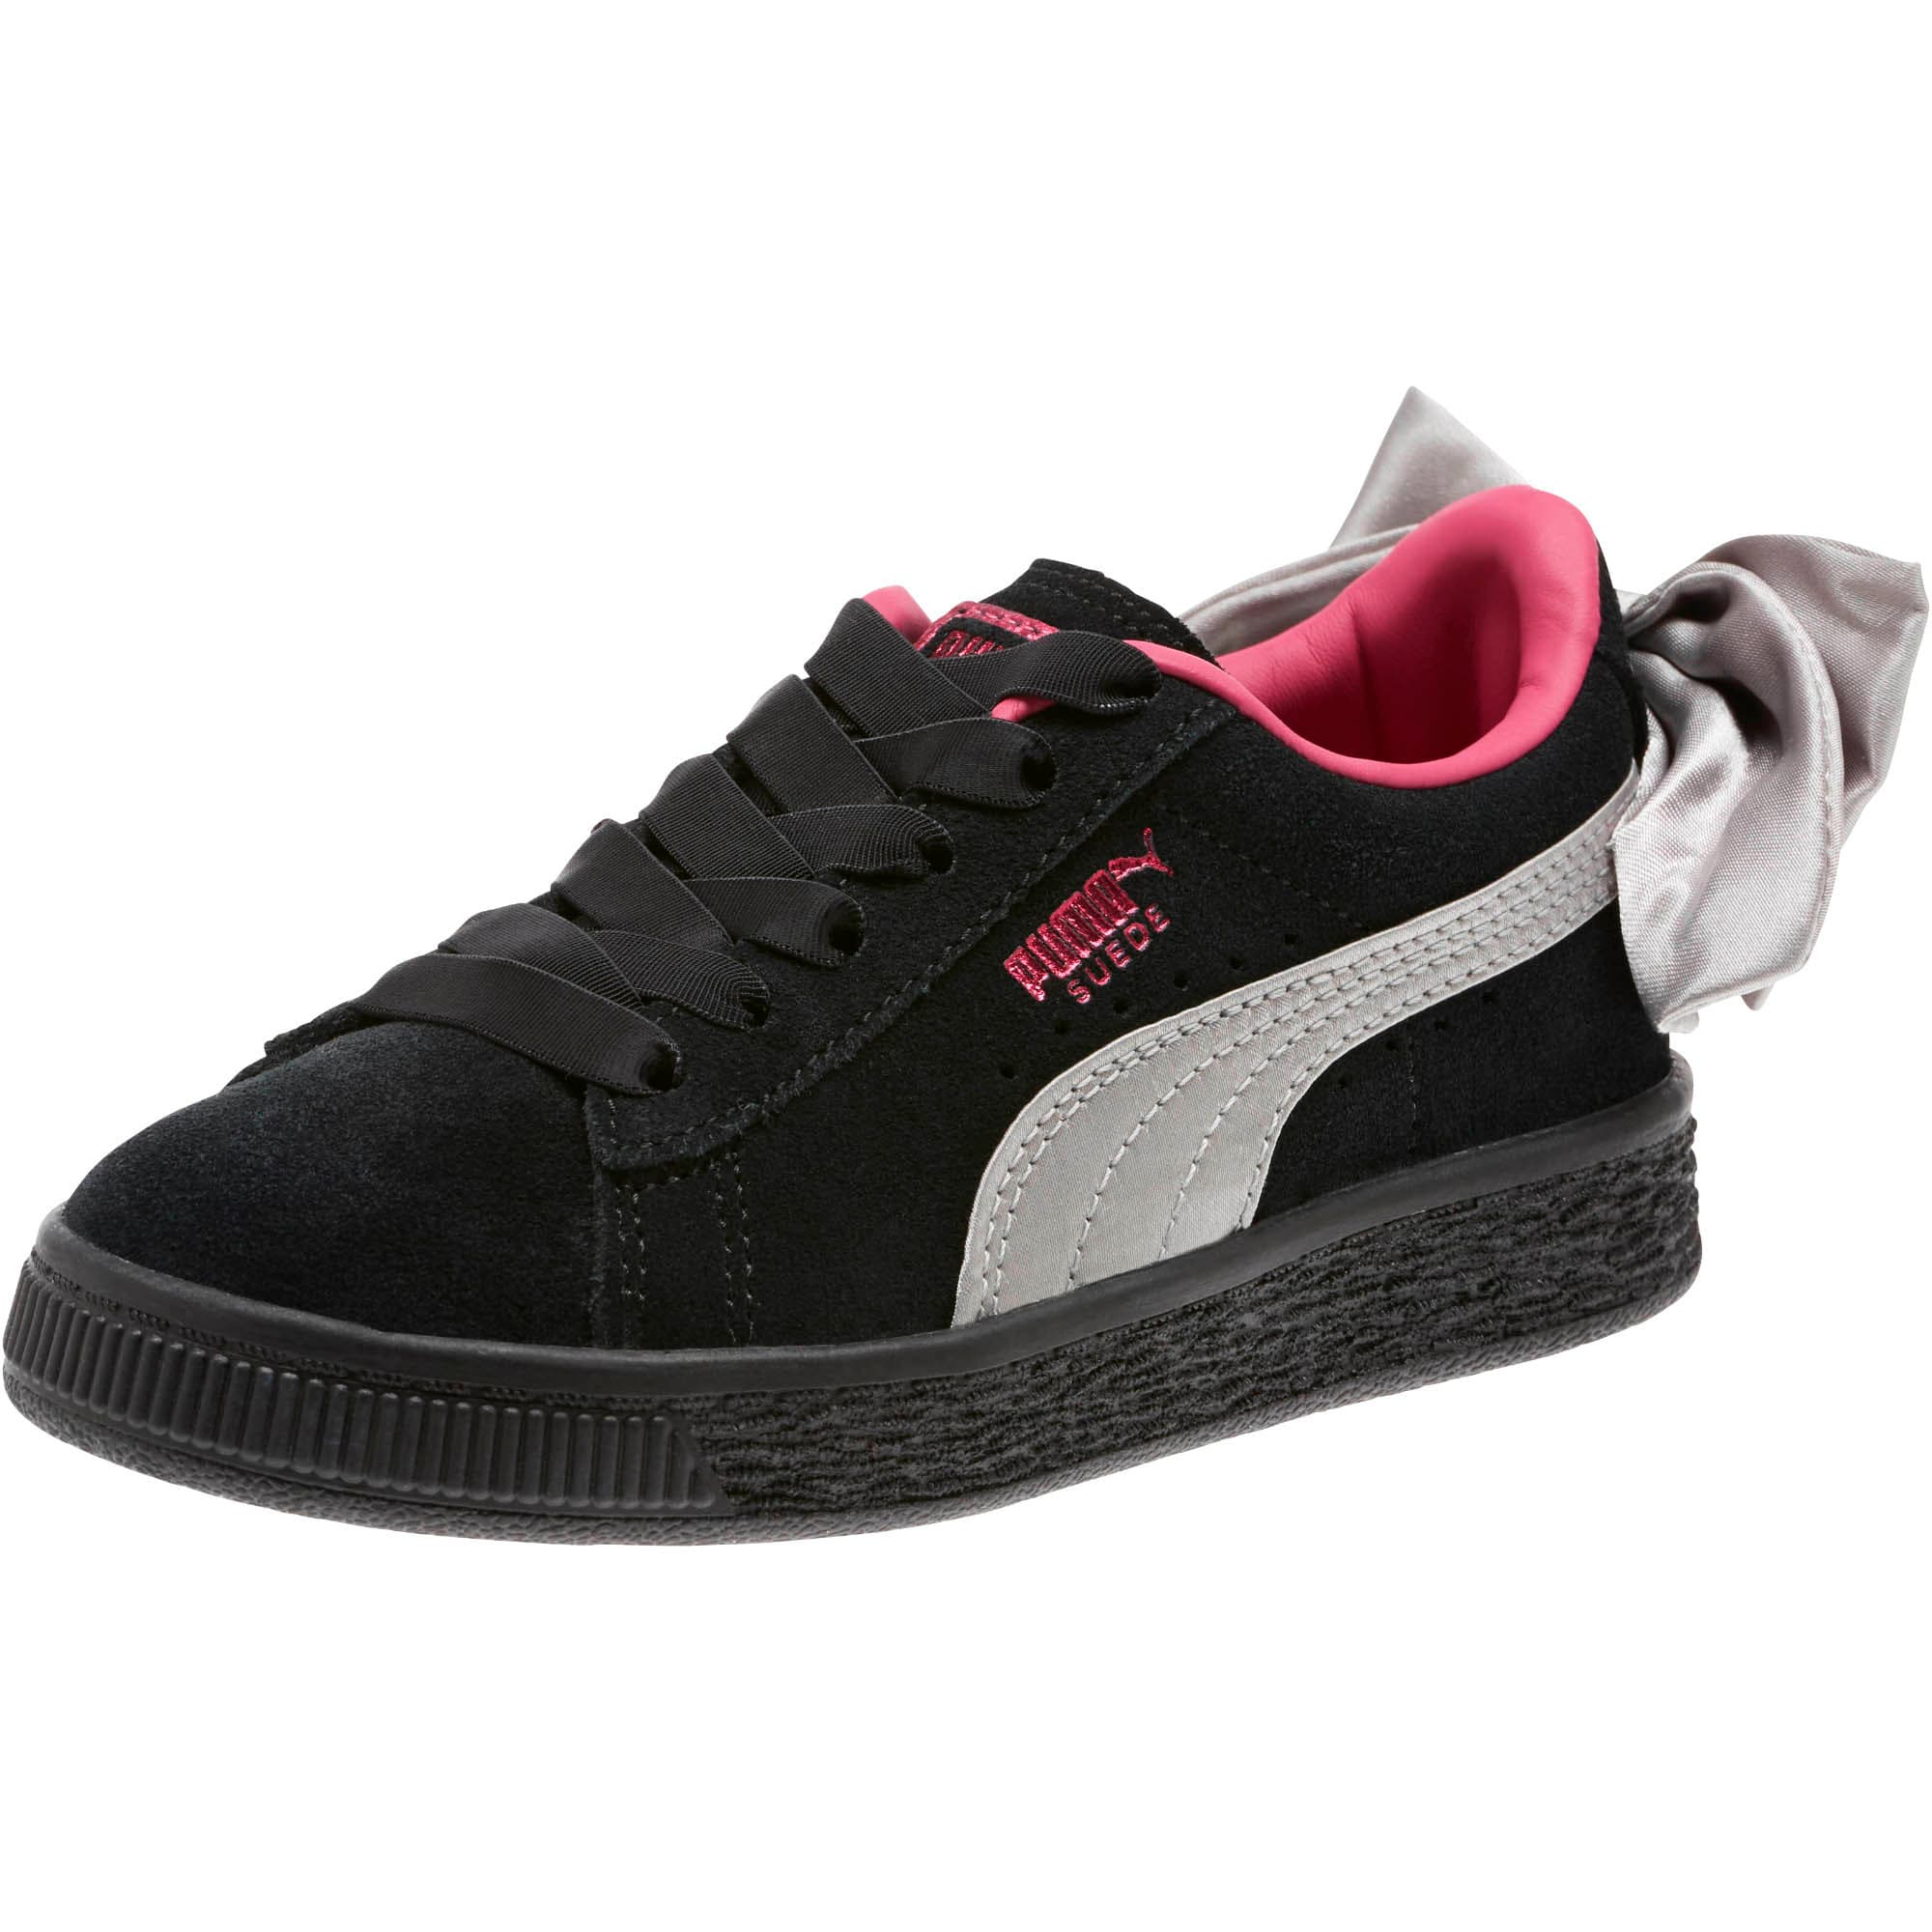 Thumbnail 1 of Suede Bow AC Little Kids' Shoes, Puma Black-Fuchsia Purple, medium